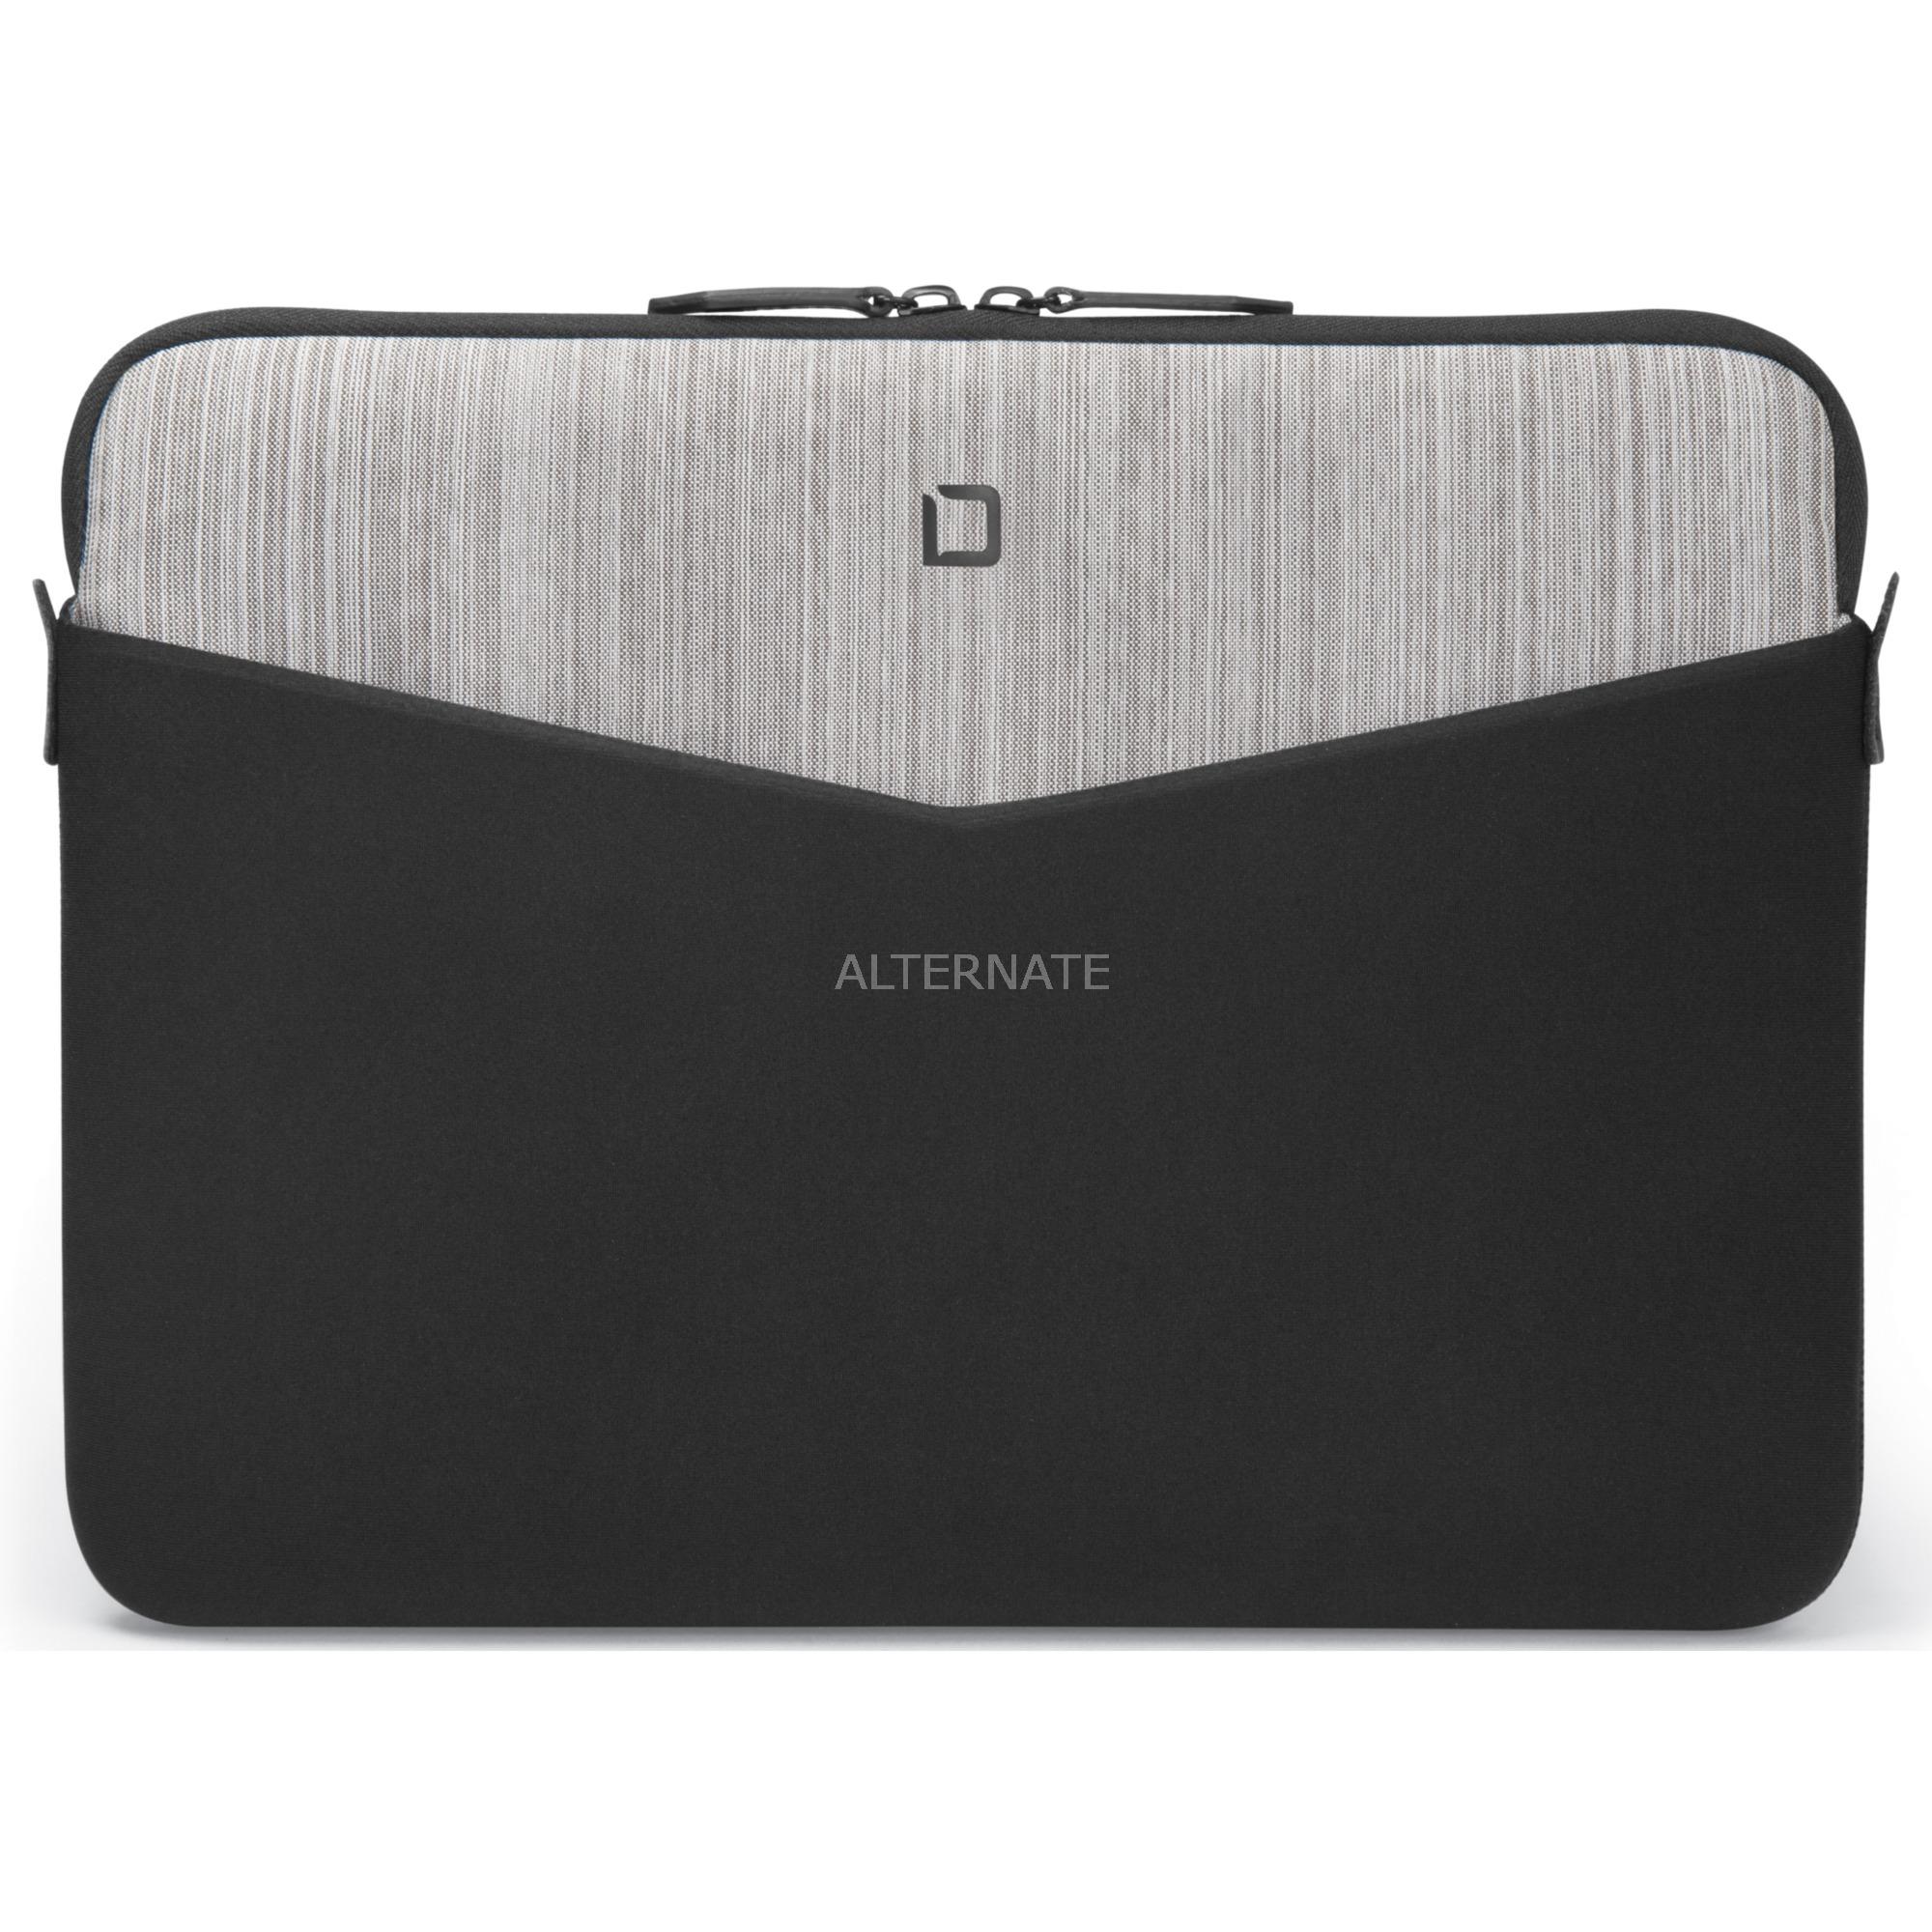 "Code Sleeve maletines para portátil 33,8 cm (13.3"") Funda Negro, Gris, Bolsa"